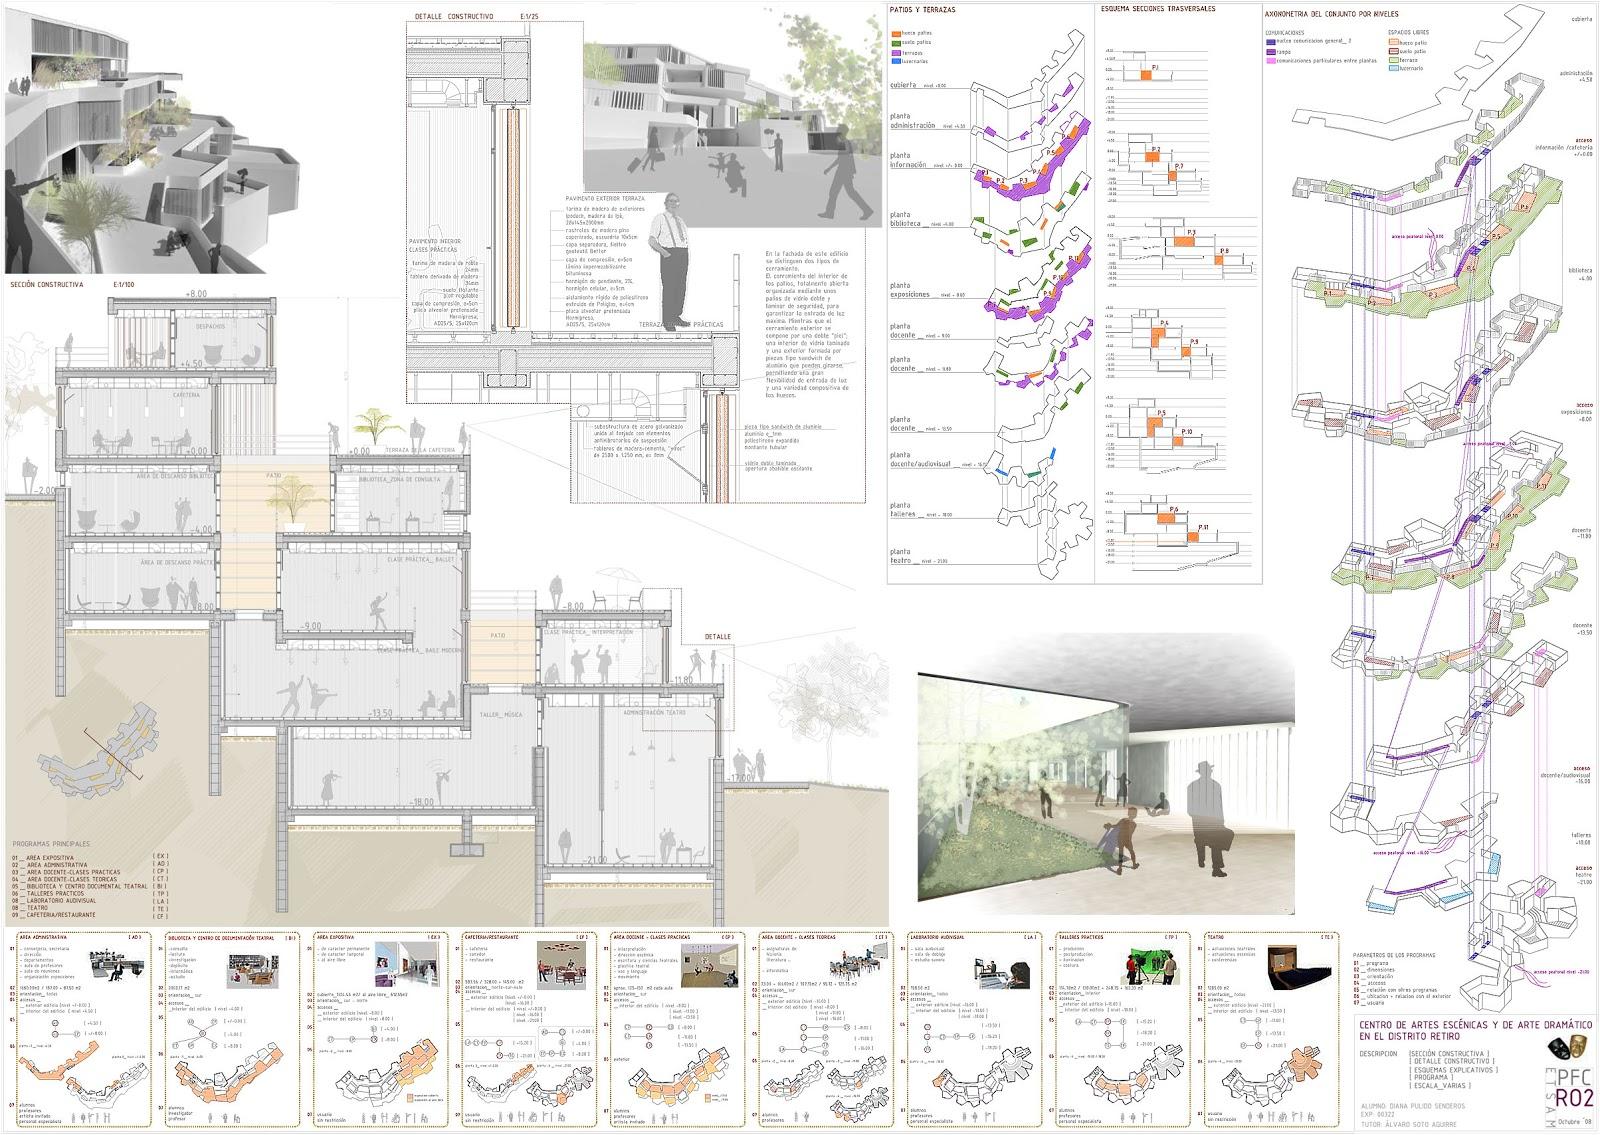 No a la arquitectura ef mera proyecto fin de carrera for Arquitectura anos de carrera